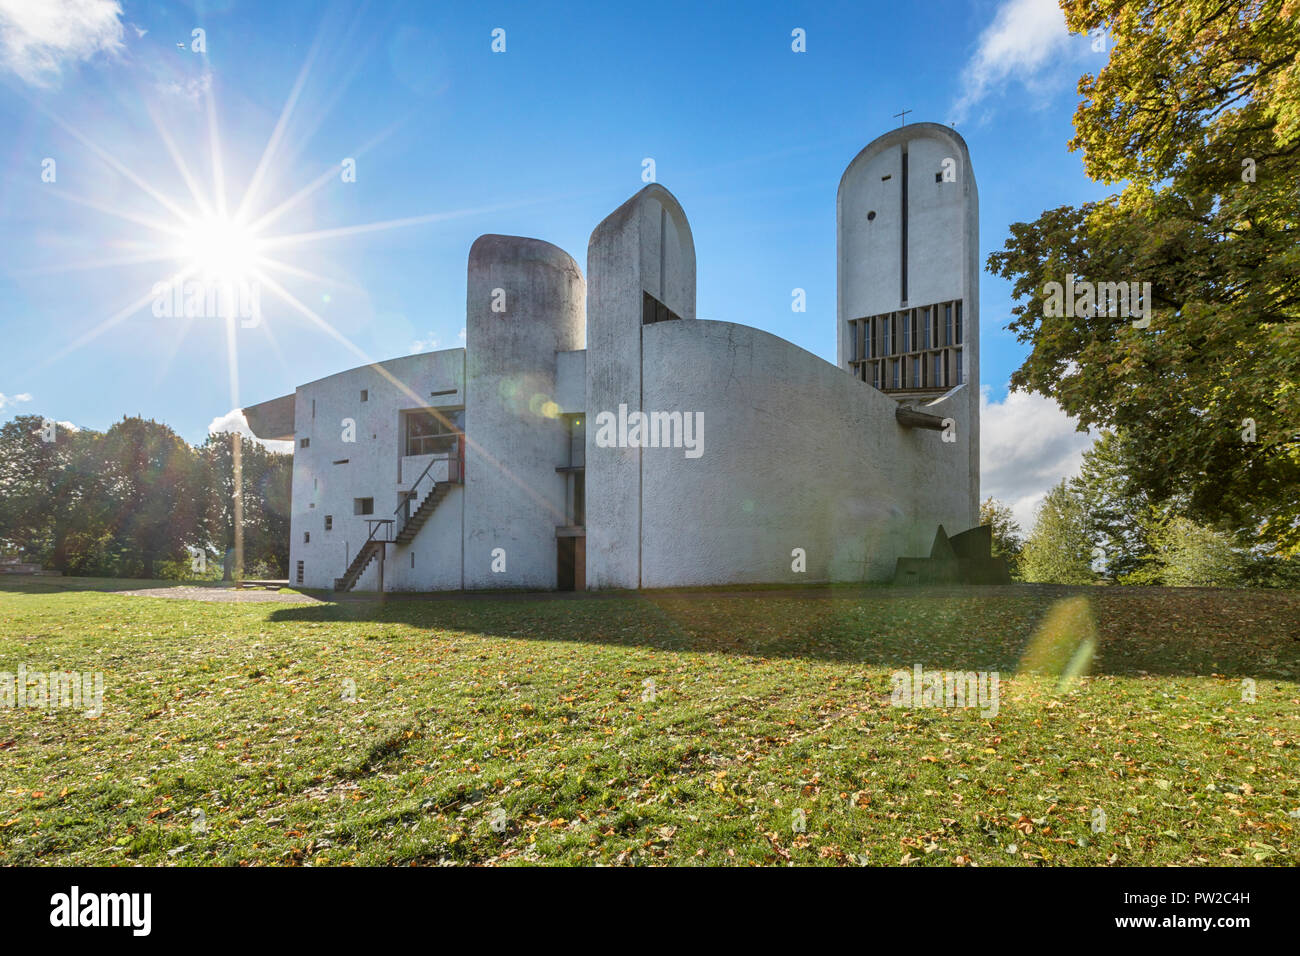 Kapelle von Notre Dame du Haut von Le Corbusier 1955 erbaut von Ronchamp, Bourgogne-Franche-Comté, Frankreich. Nort-Western Anzeigen gegen Morgen s Stockfoto